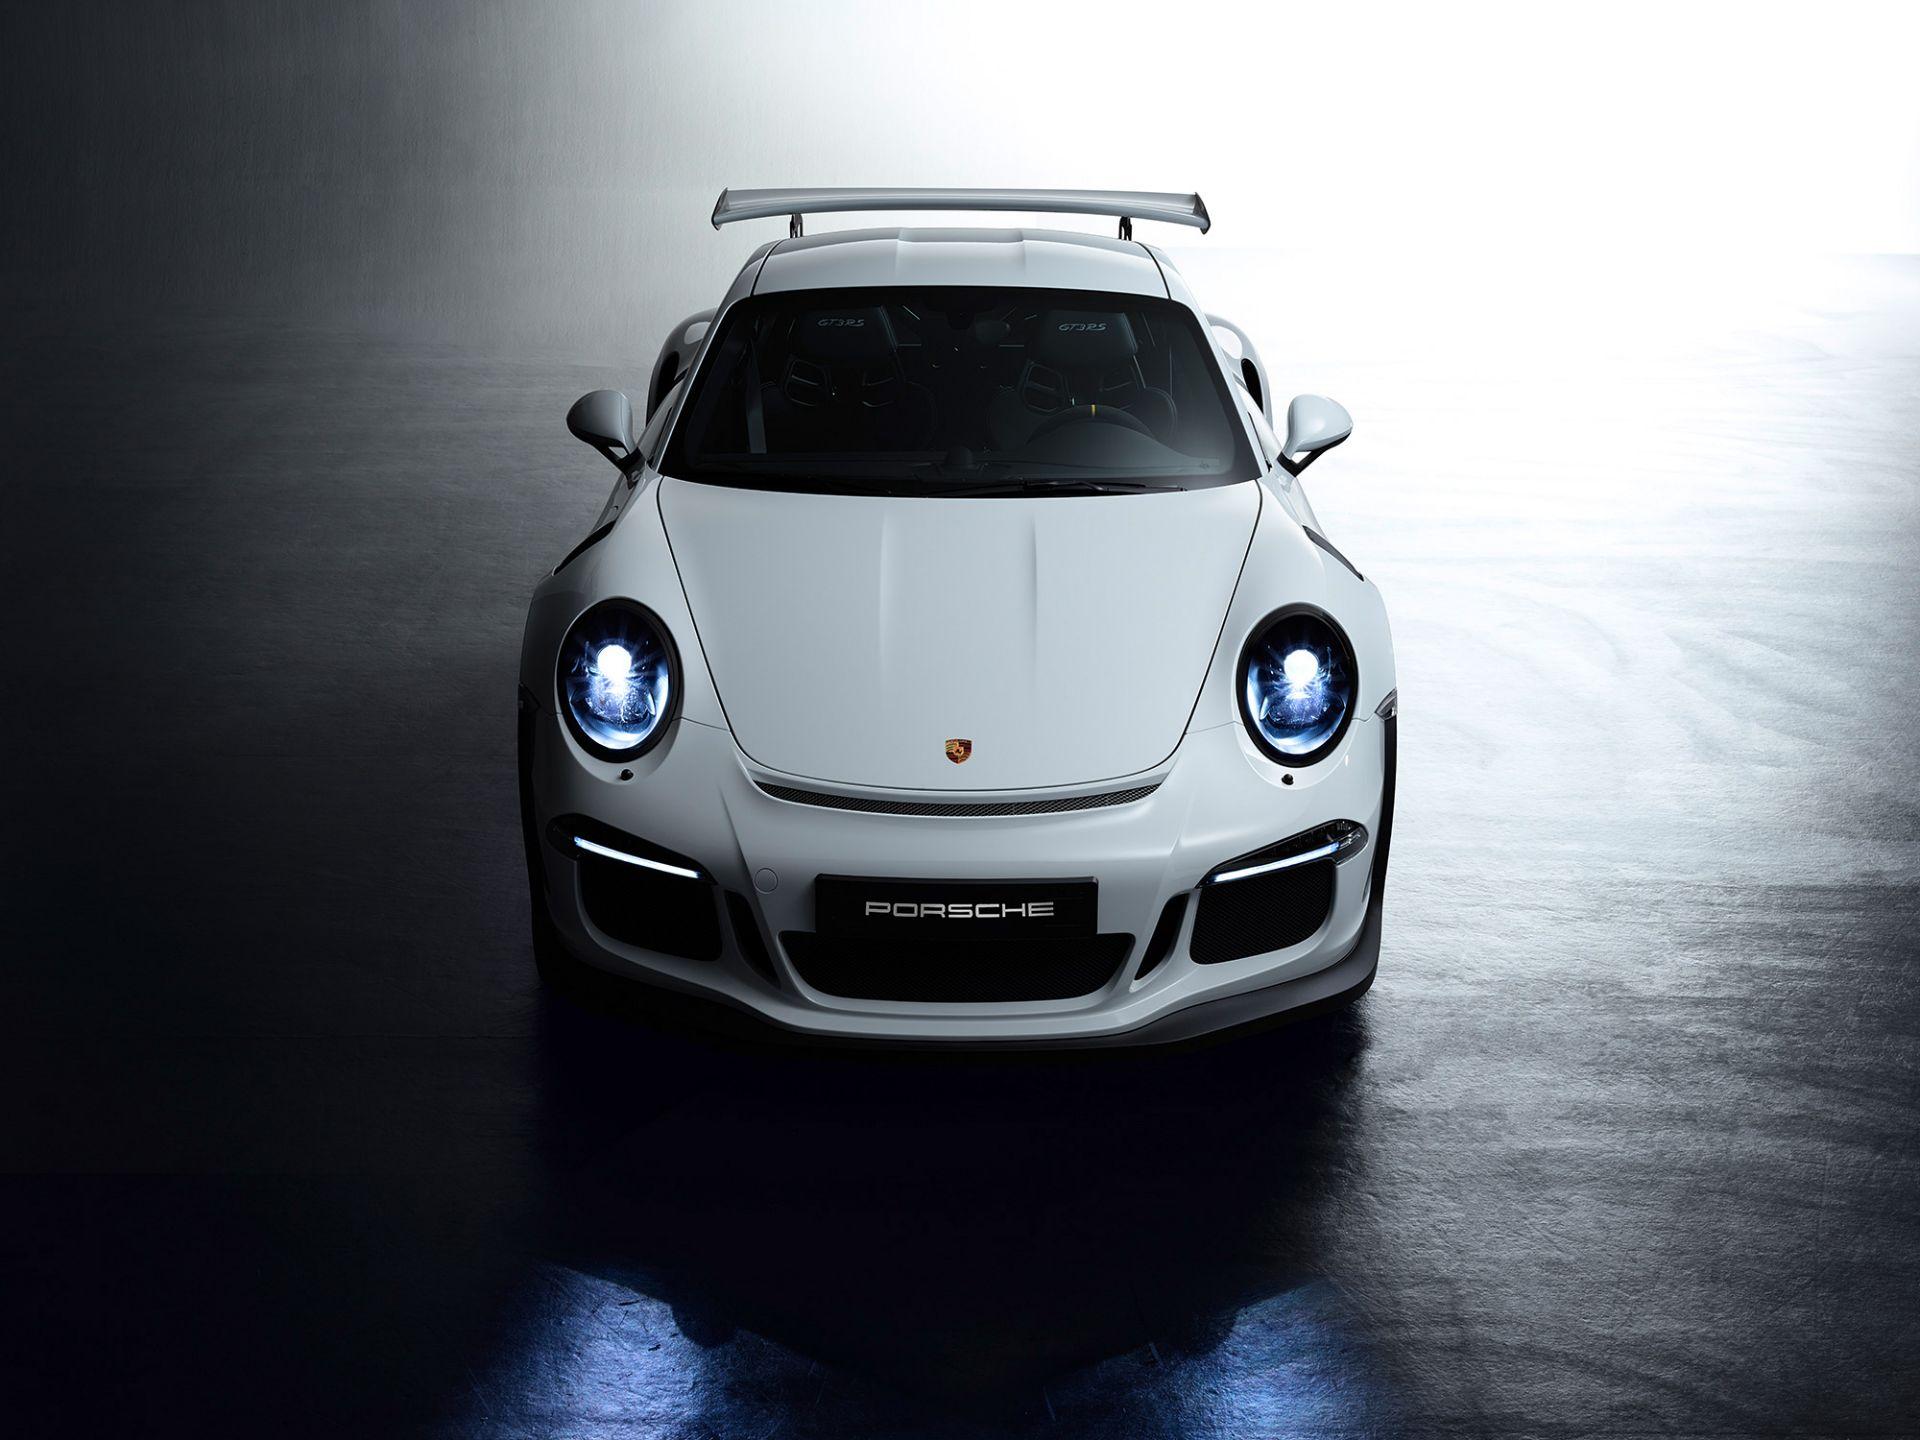 Los 9 - Porsche 911 (991G) GT3 RS Clubsport + TECHART Sportpacket Carbon inklusive 6 Monate kostenloser